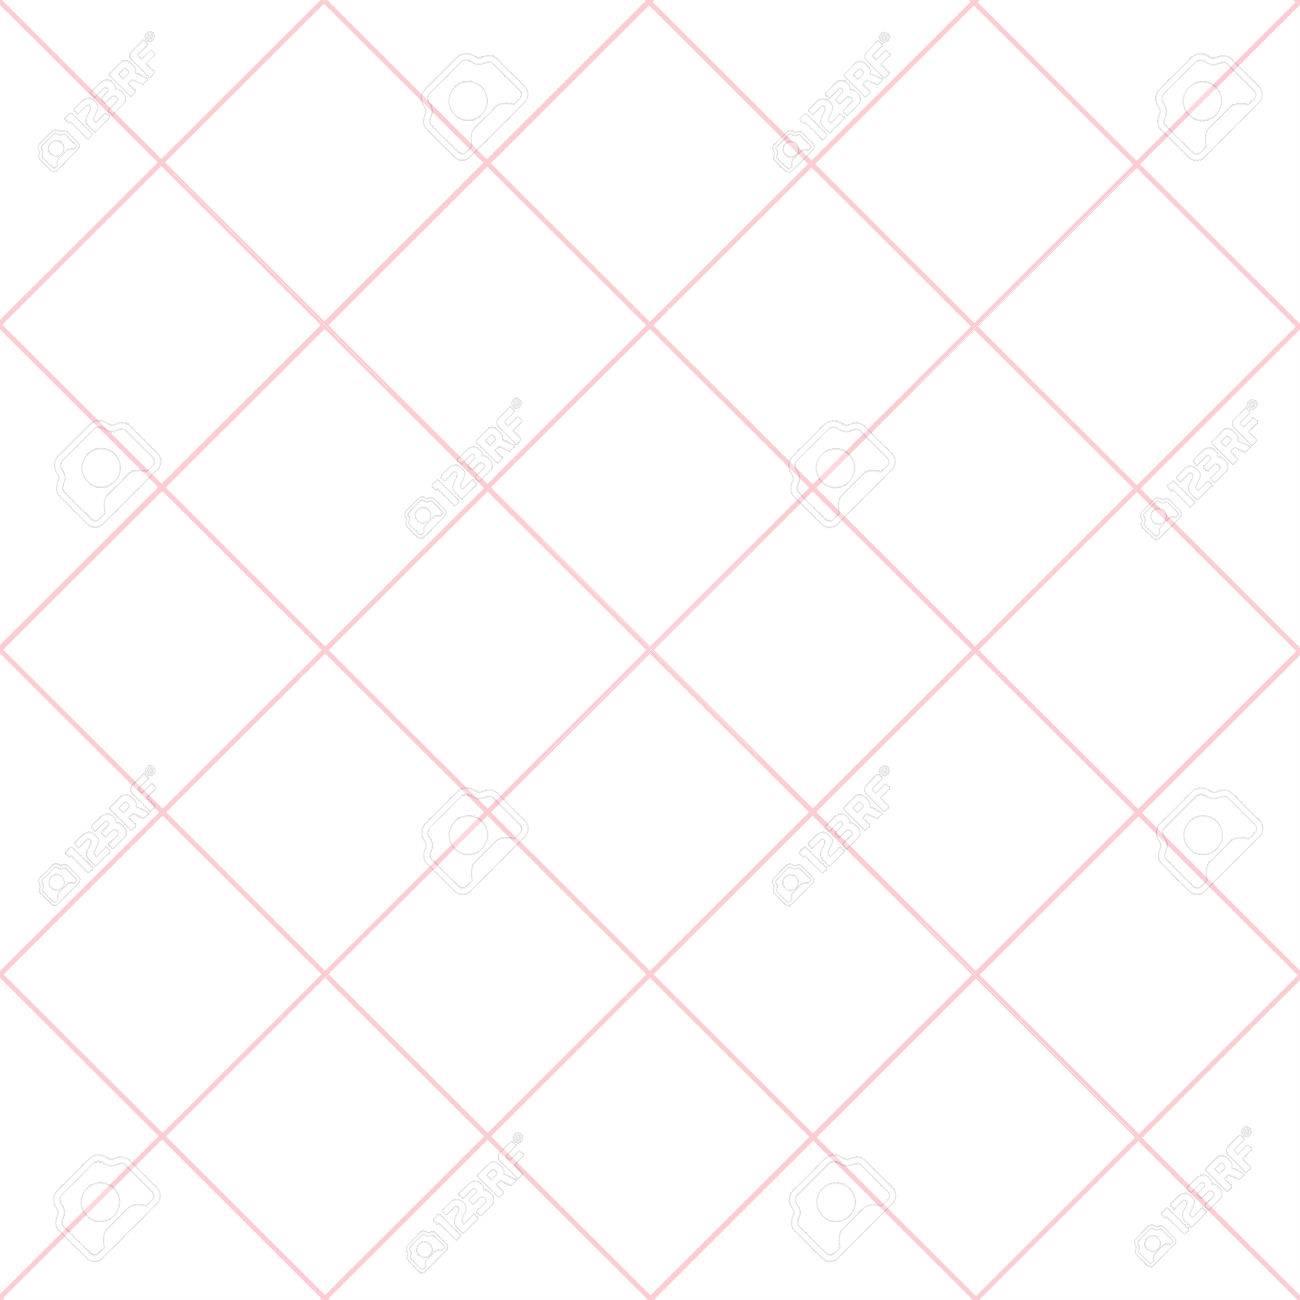 Pink Grid White Diamond Background Vector Illustration